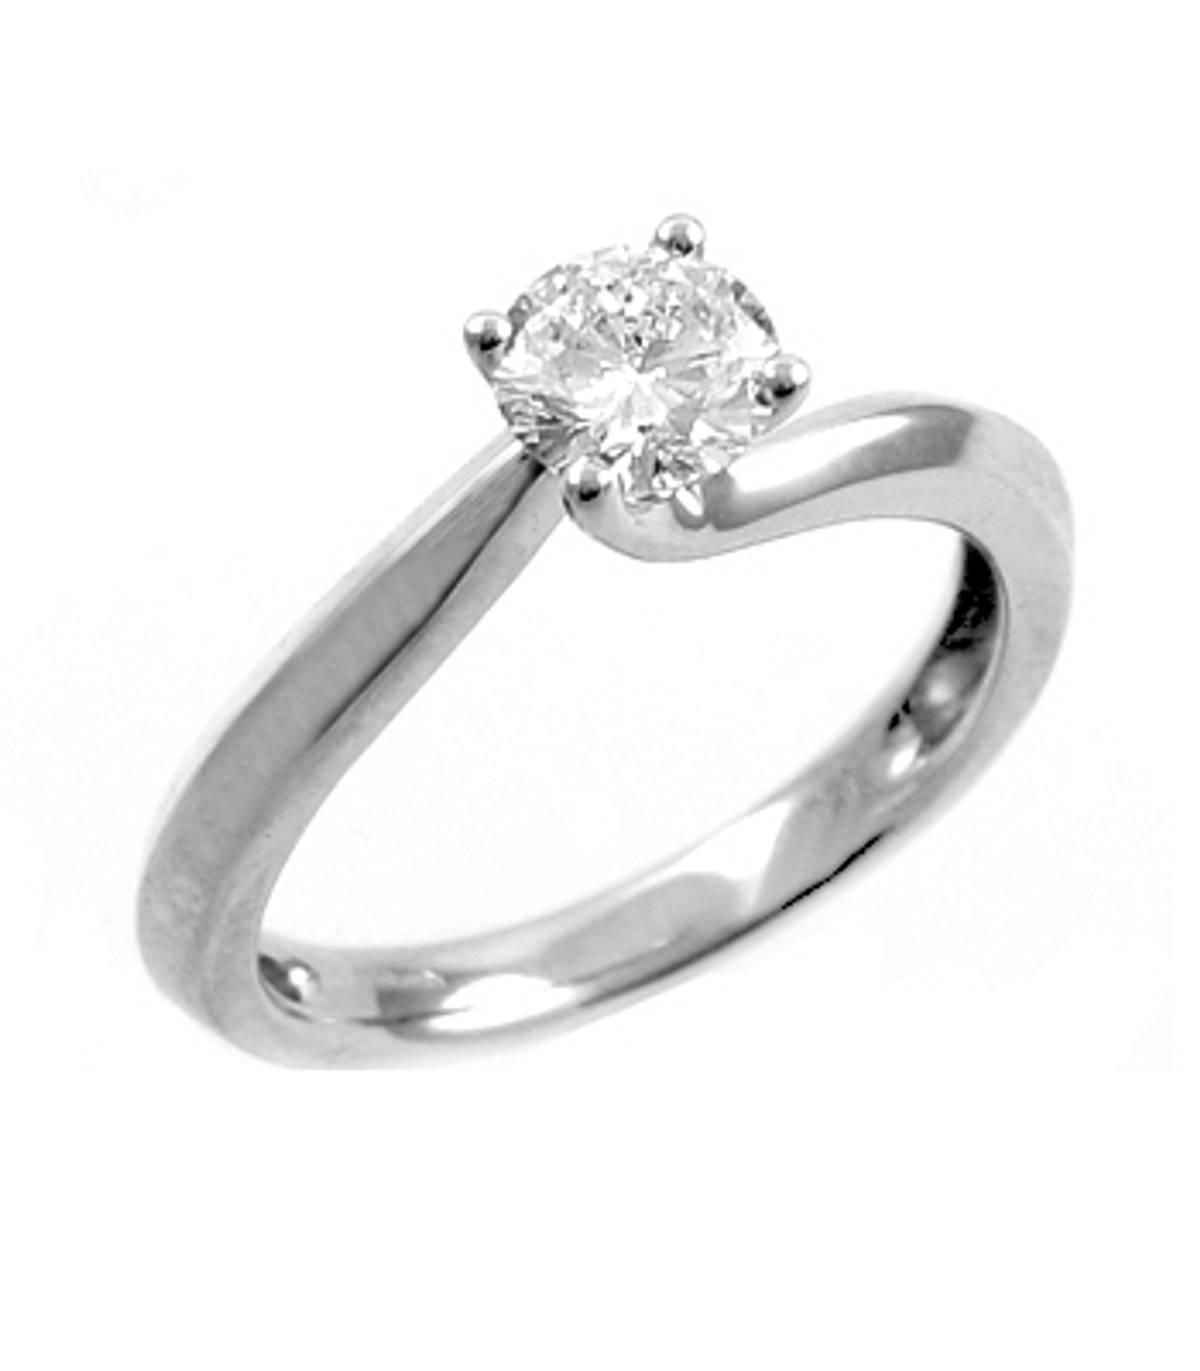 Irish made0.41ct brilliant cut diamond 4-claw twist engagement ringin 18ct white gold.